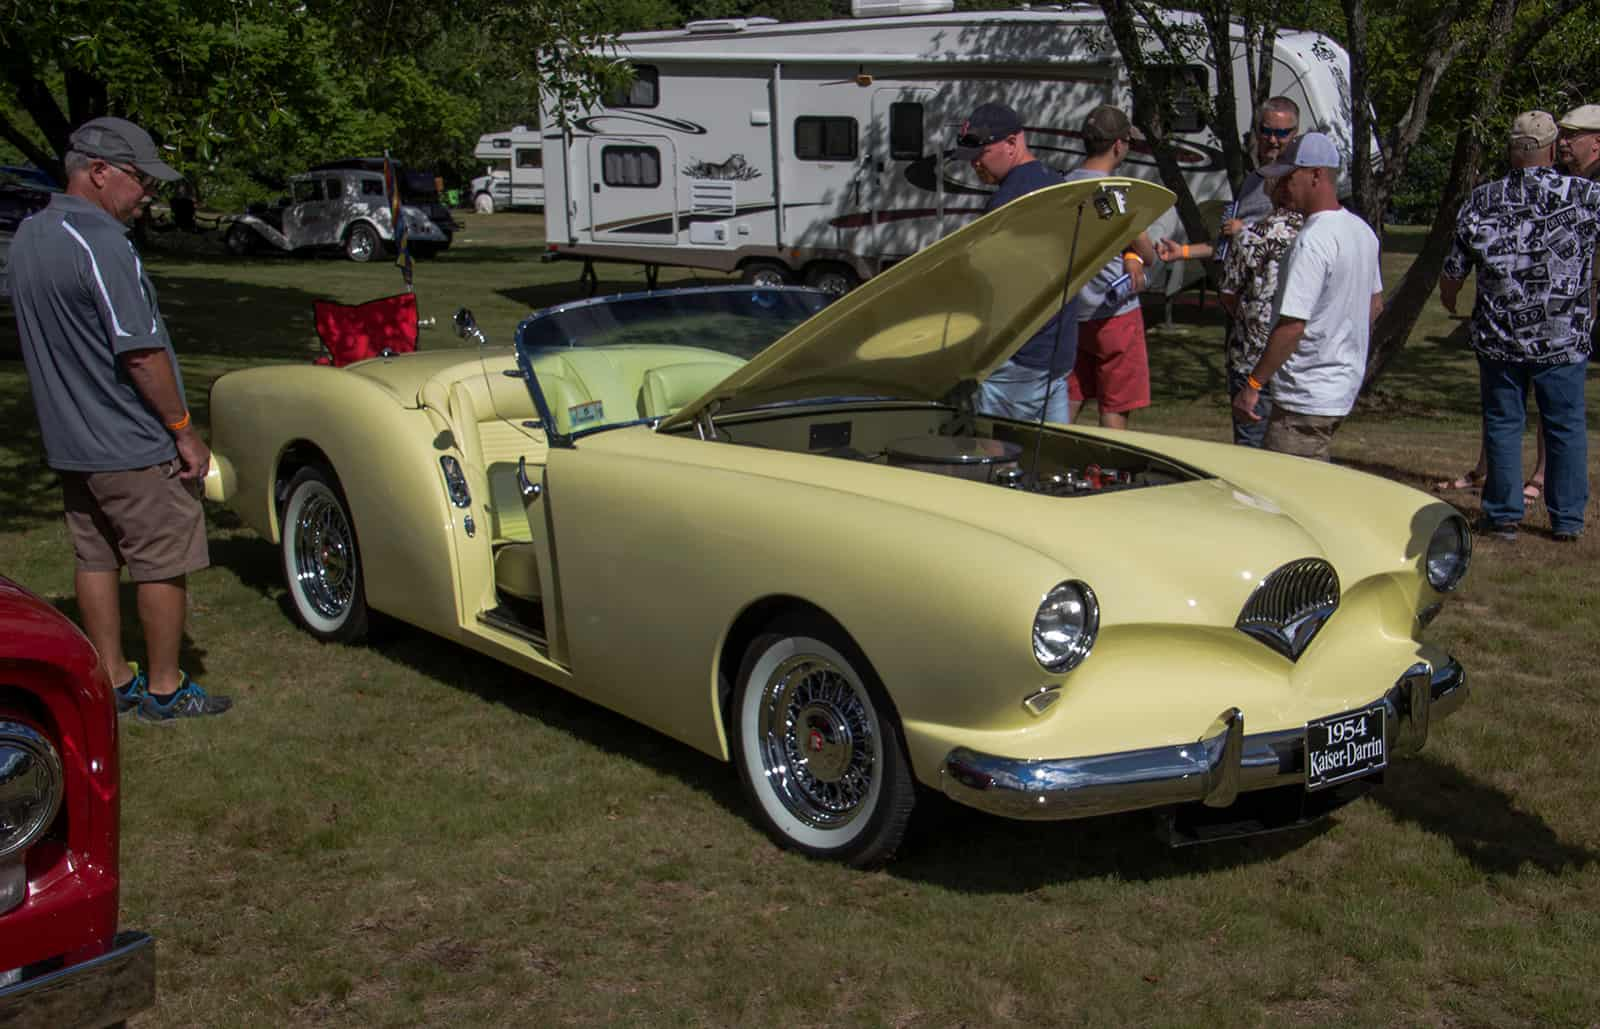 2016 Cars of Summer Vintage